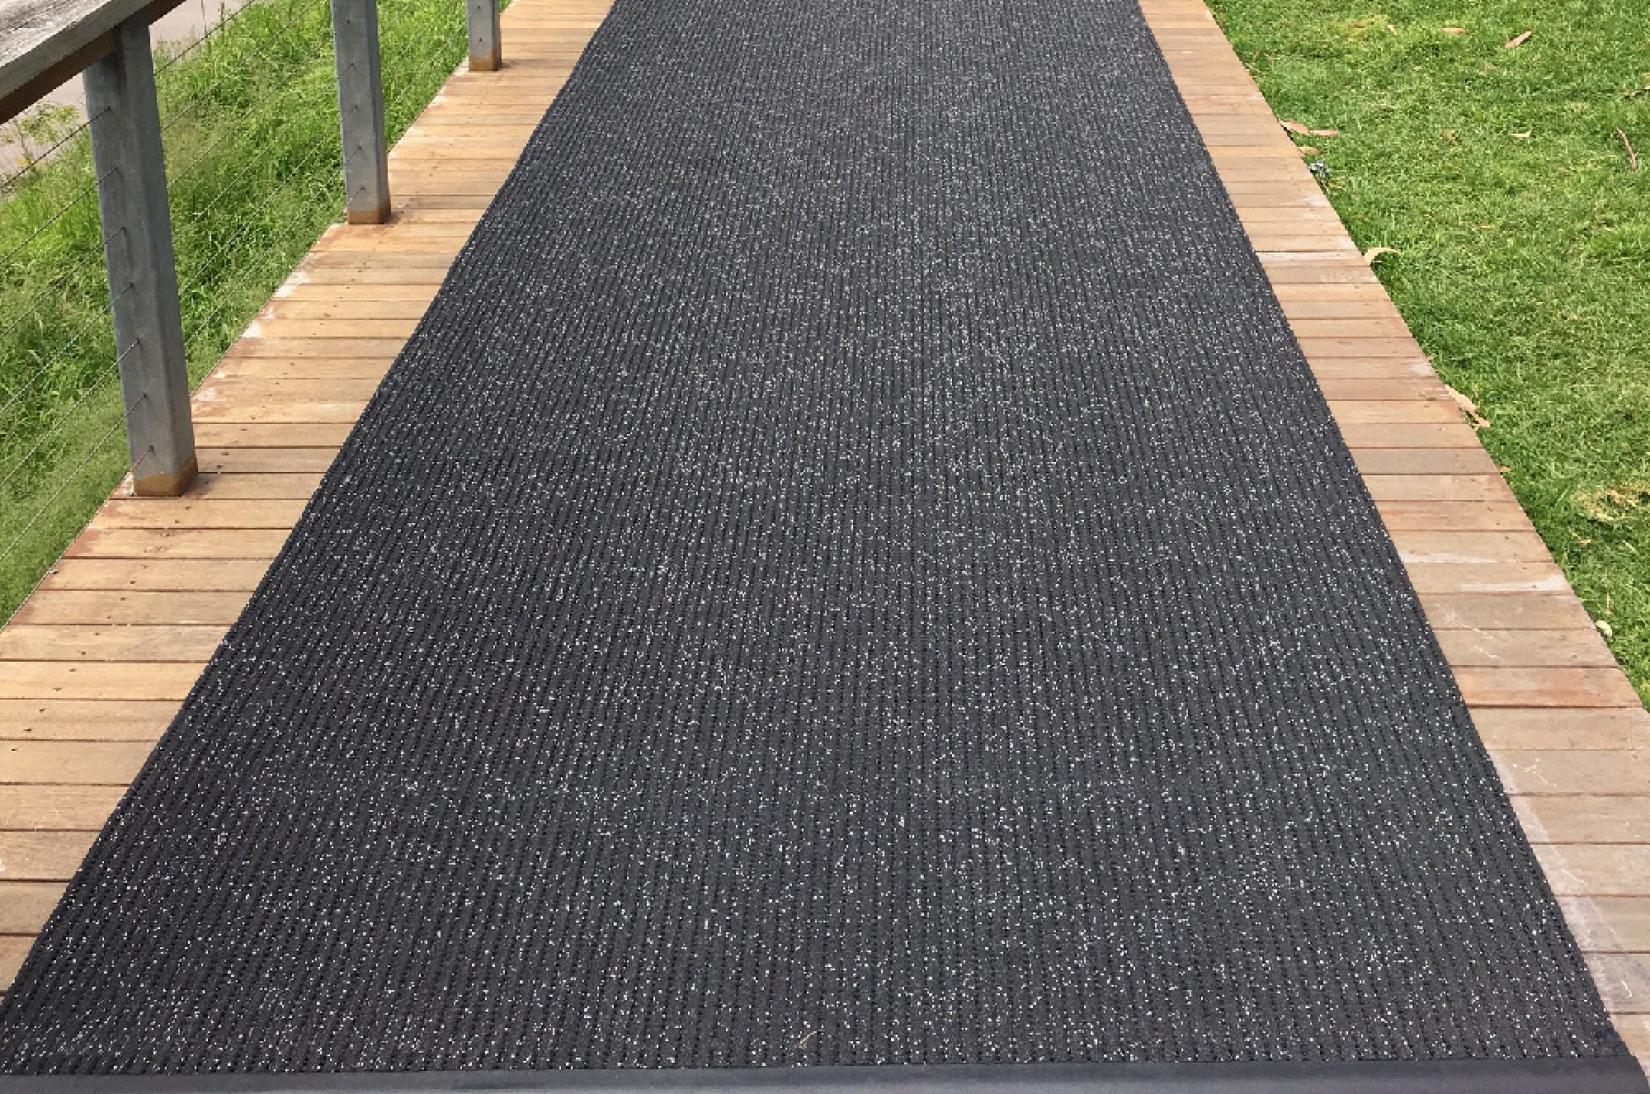 AKOplus Safety Entrance Carpet Mat School Education Anti Slip